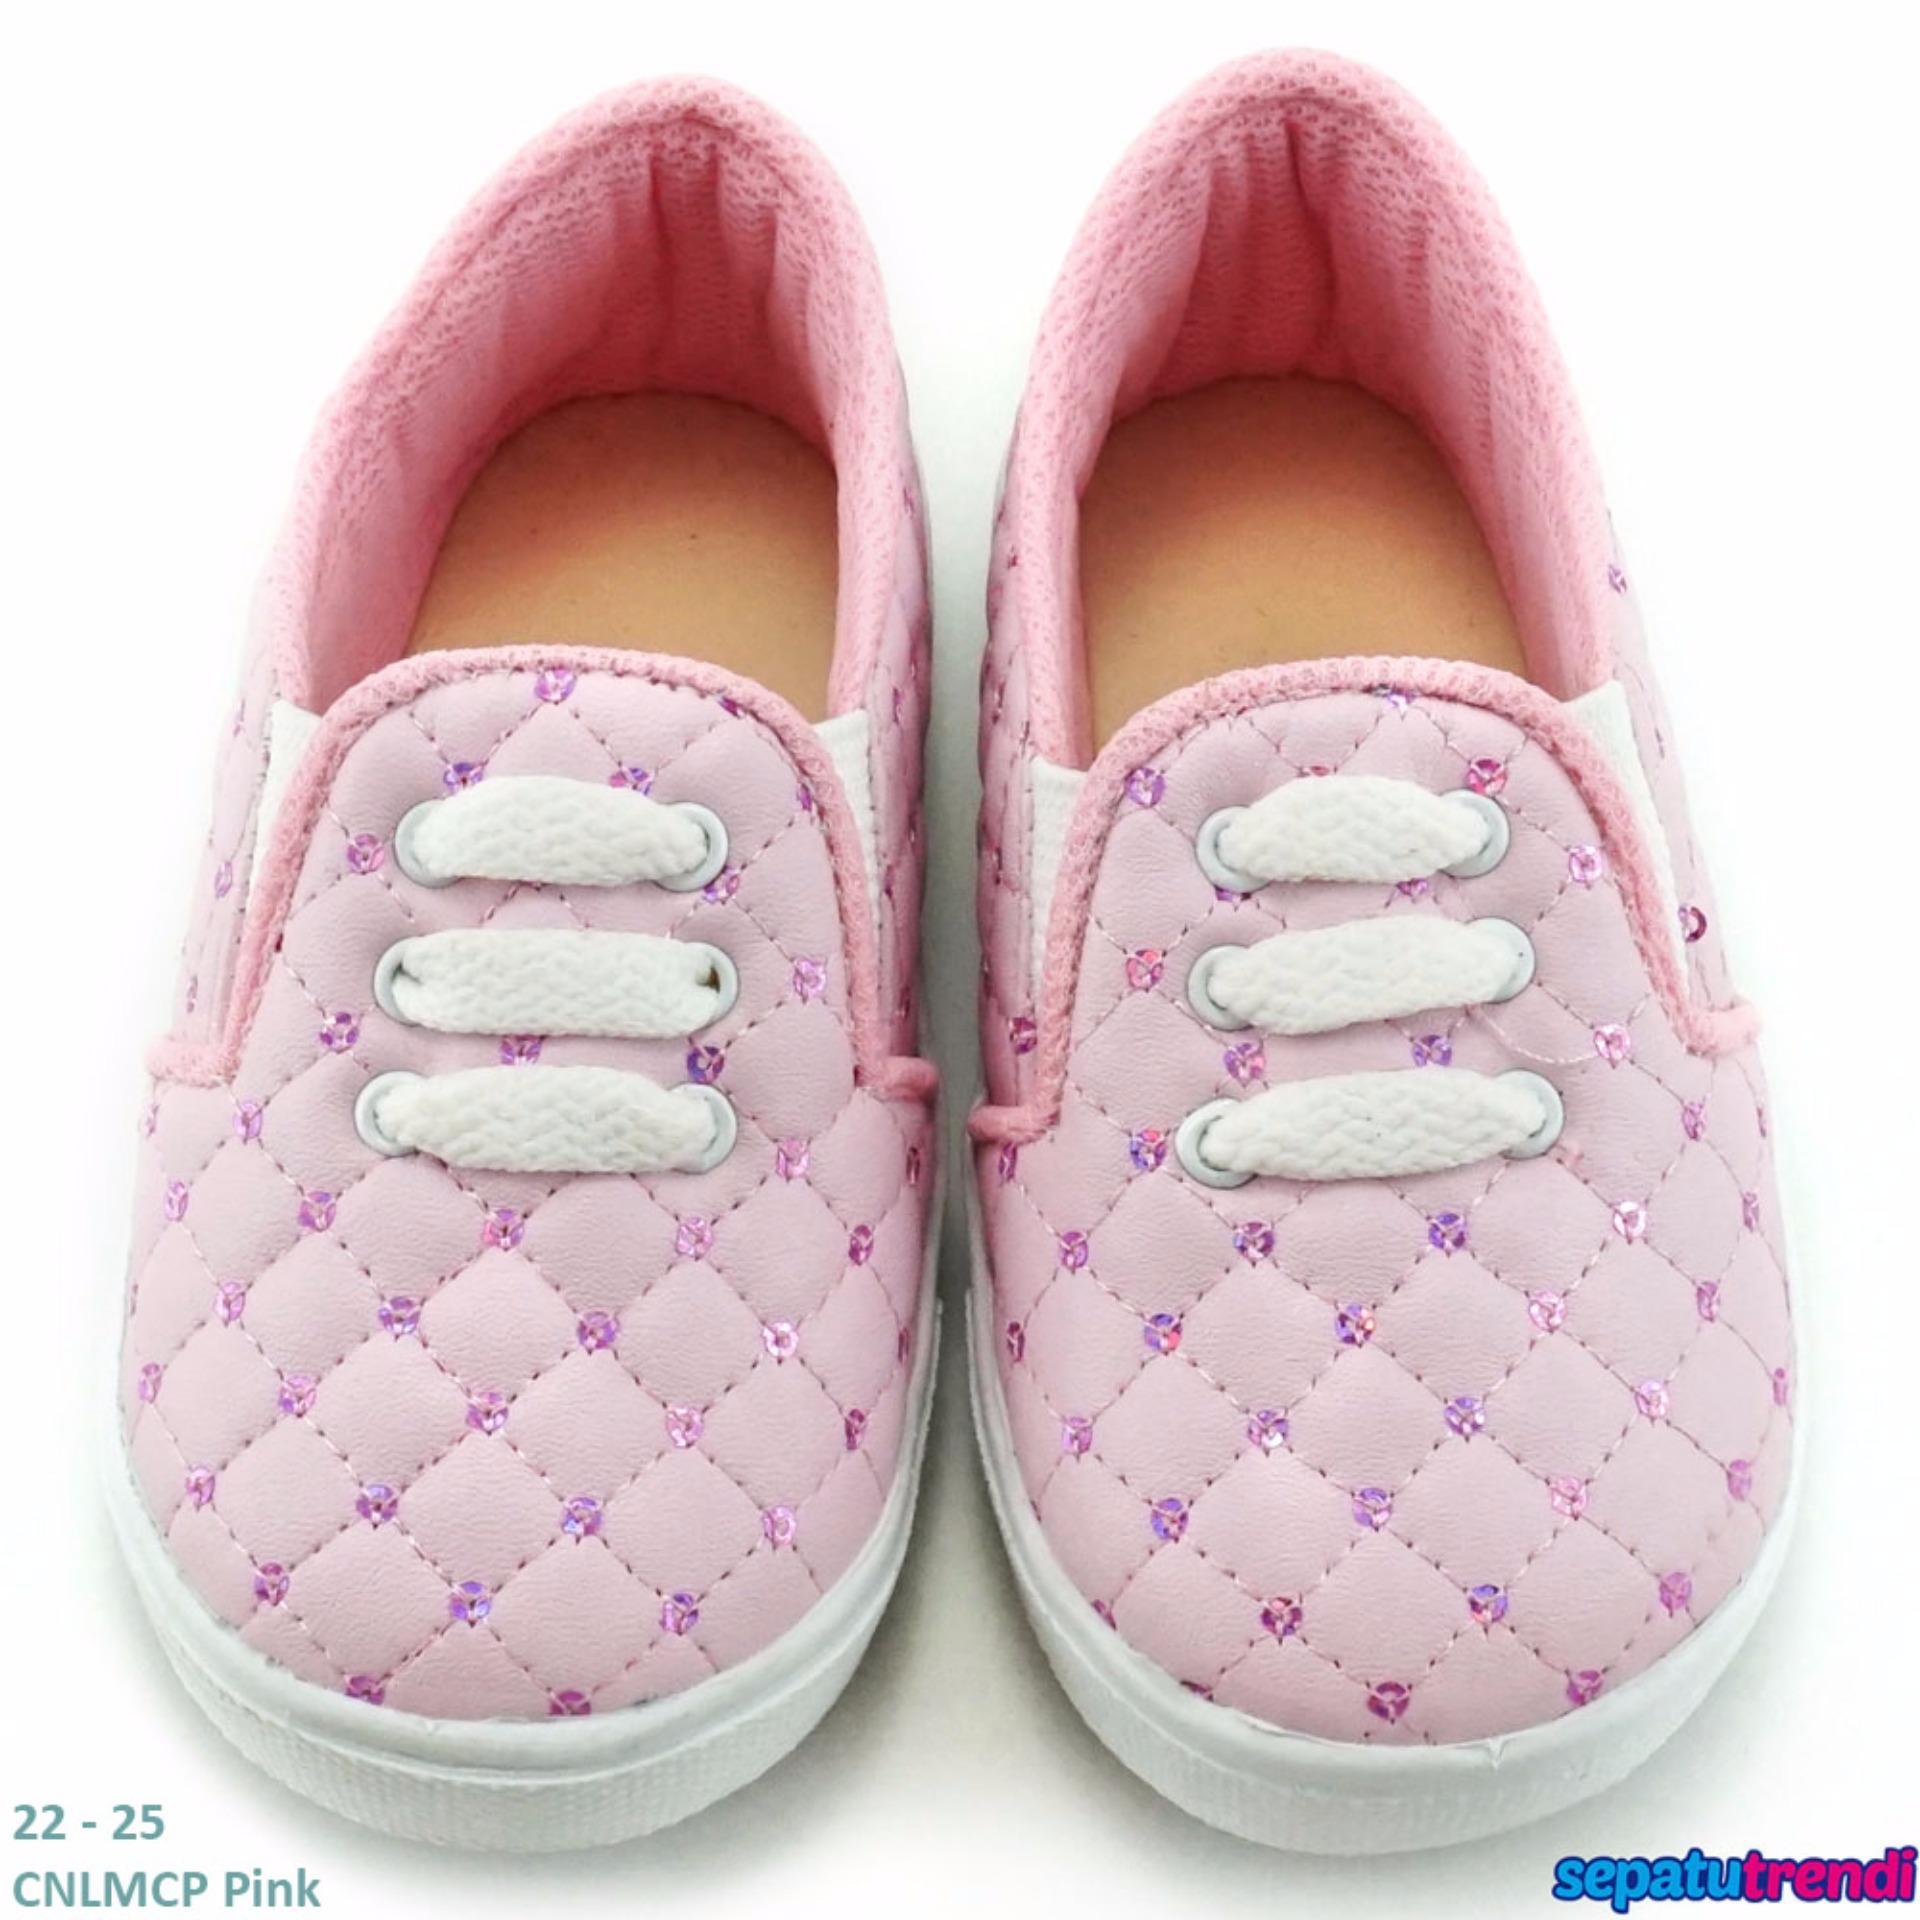 TrendiShoes Sepatu Anak Perempuan Slip On Variasi 3 Tali CNLMCP -Pink .